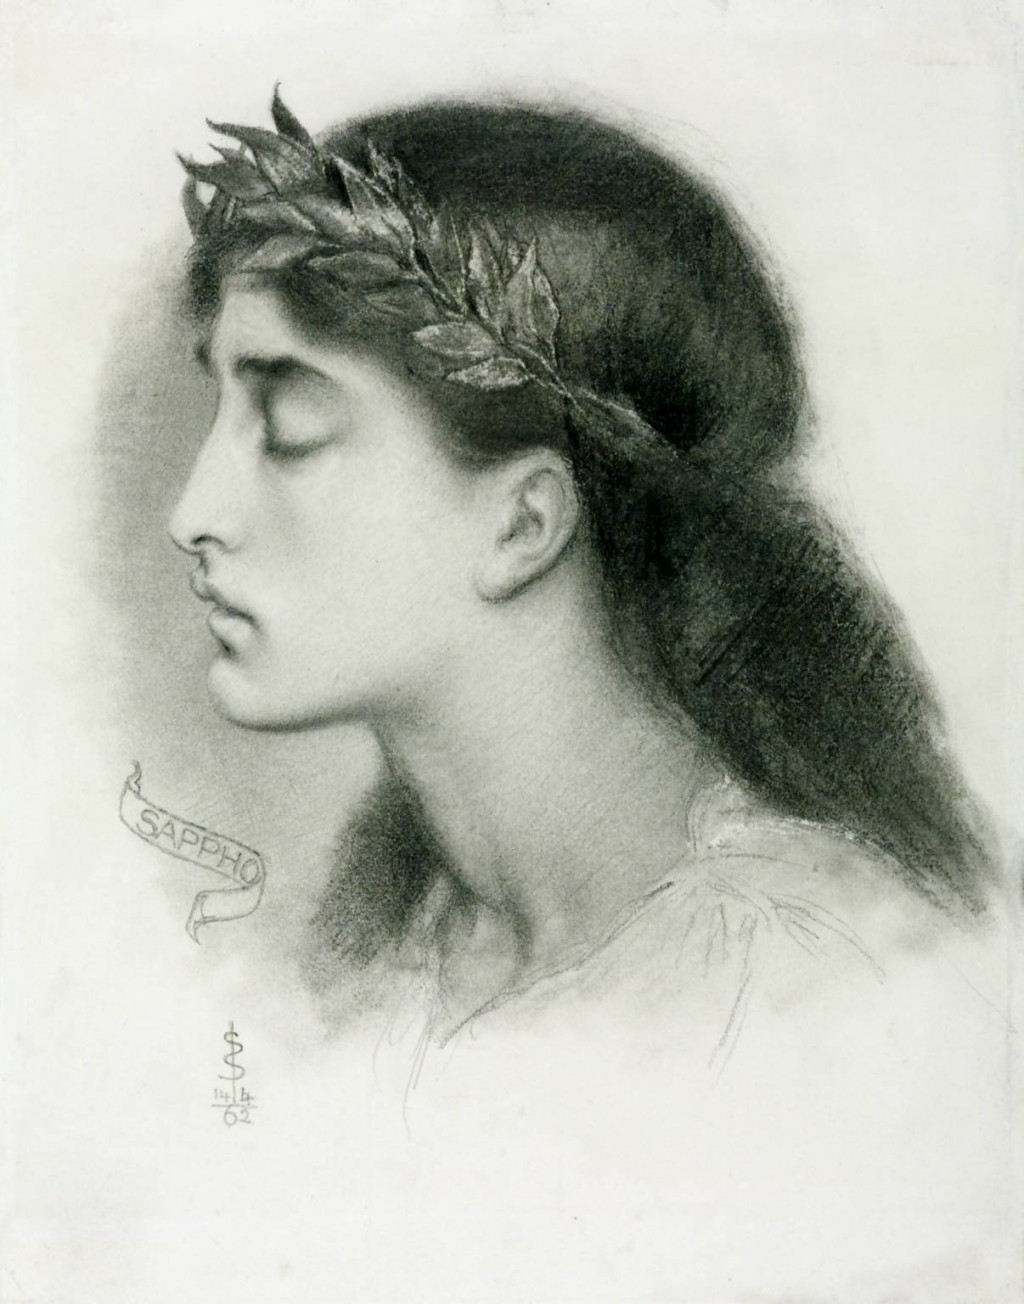 Study of Sappho 1862 Simeon Solomon 1840-1905 Purchased 1980 http://www.tate.org.uk/art/work/T03104